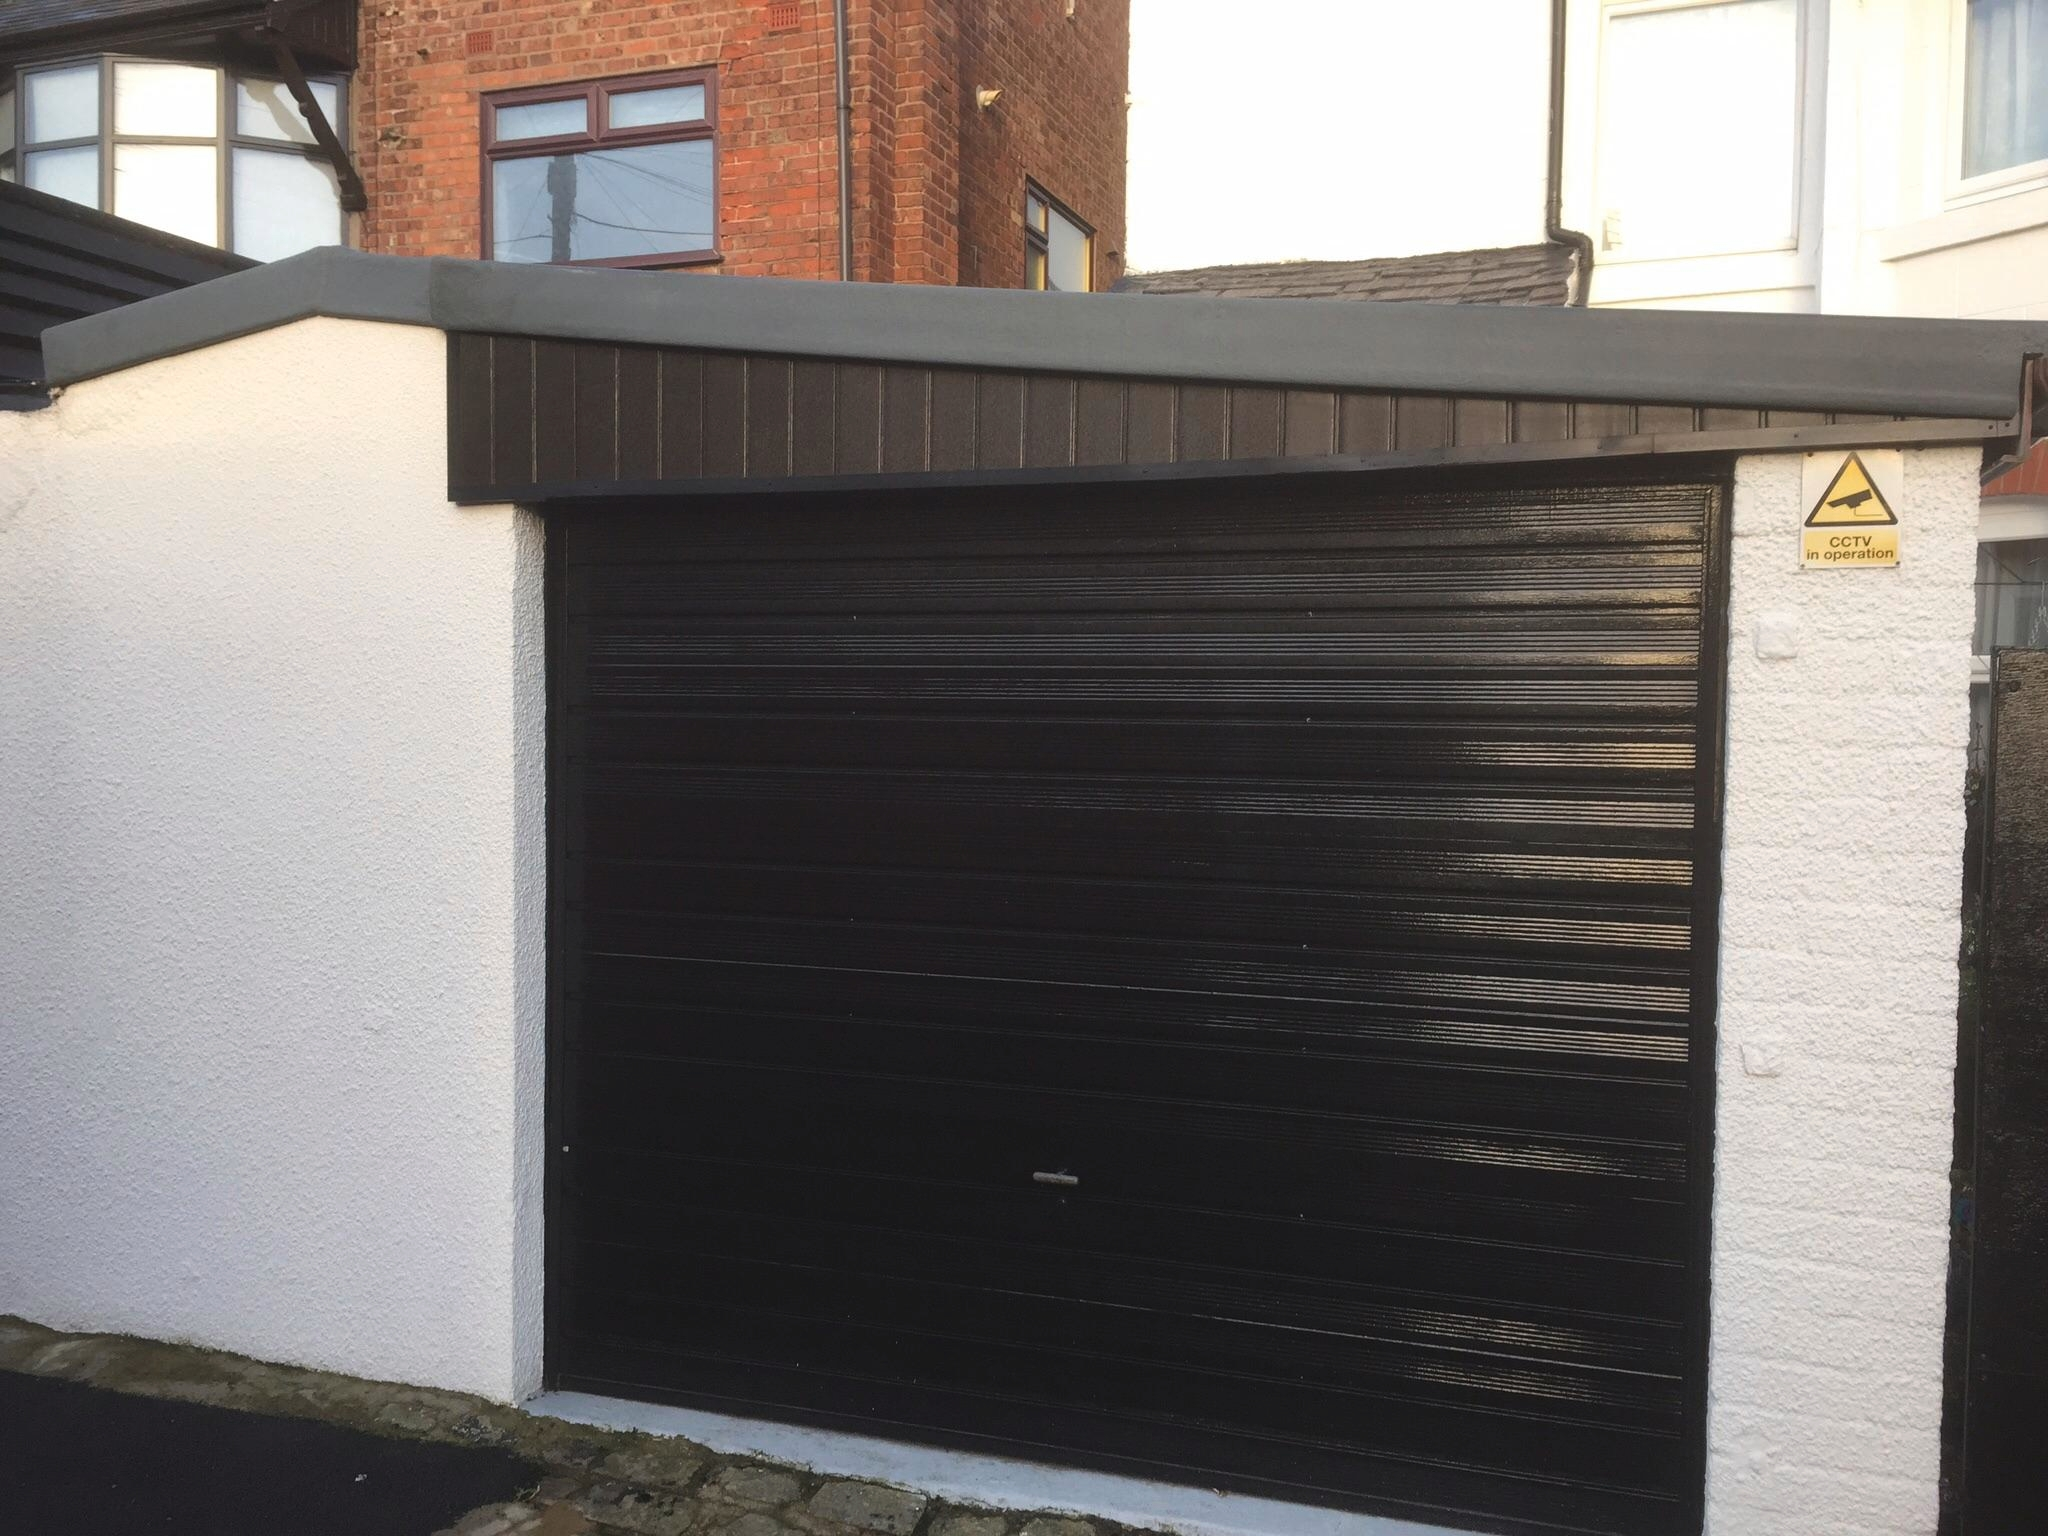 Wyles Roofing Ltd